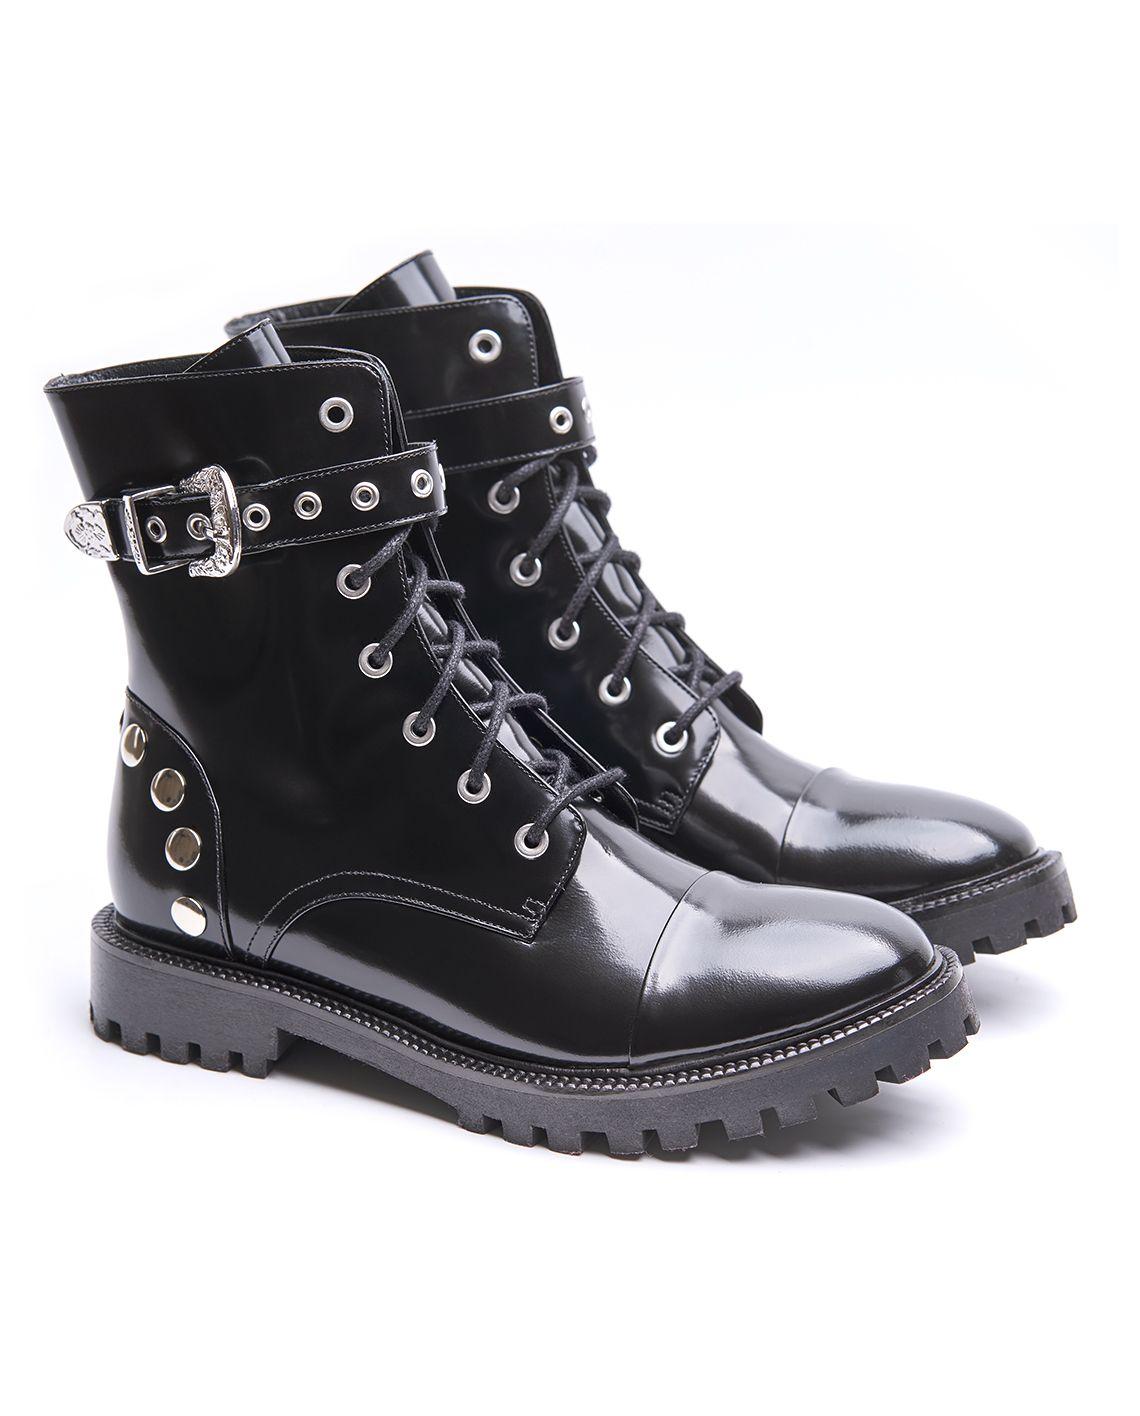 b2aa7e8be47 Western Buckle Boots | топай | Buckle boots, Boots, Lace up ankle boots